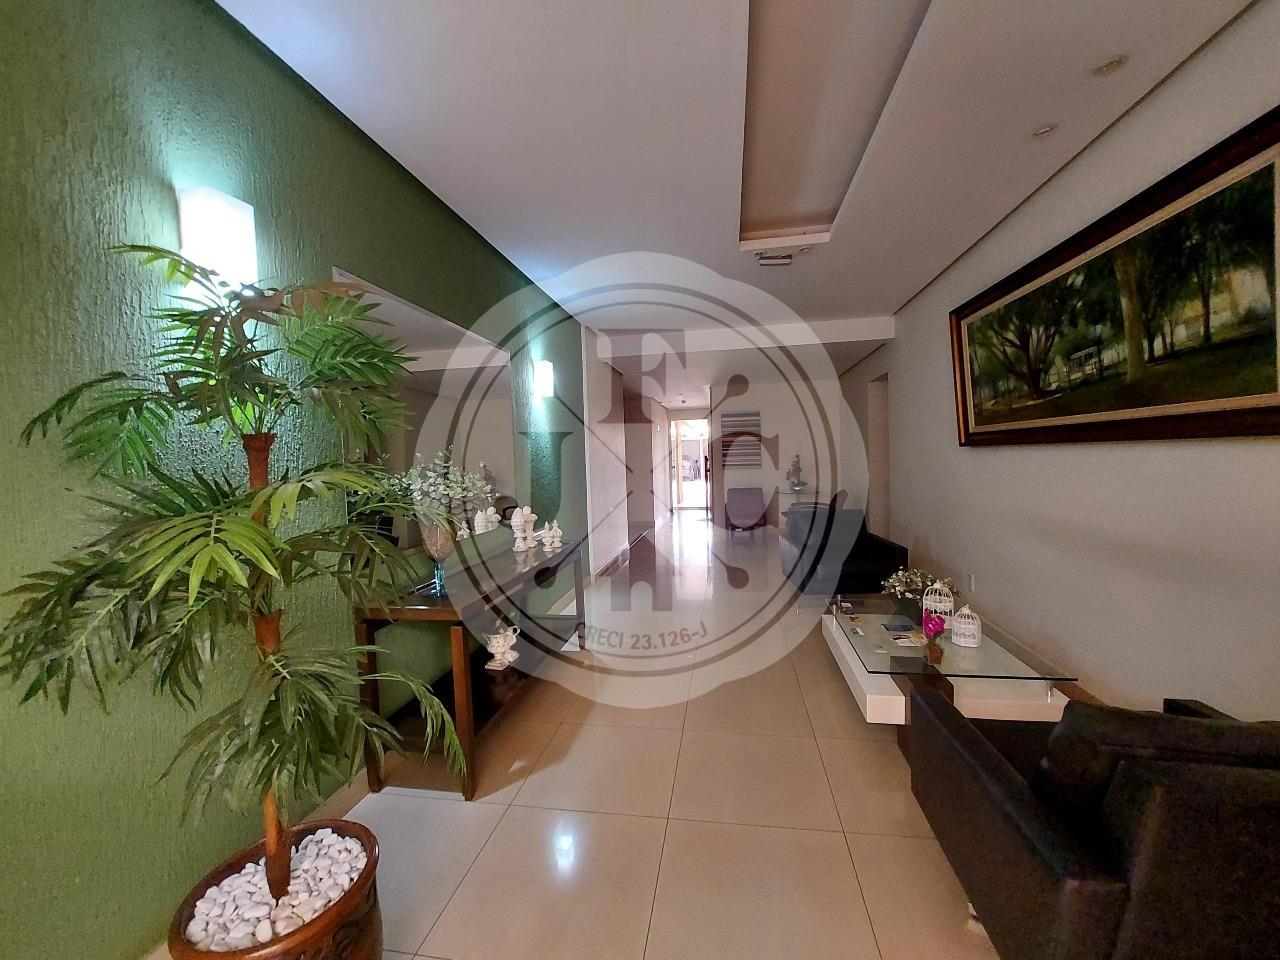 Apartamento para aluguel no Vila Seixas: Hall Social